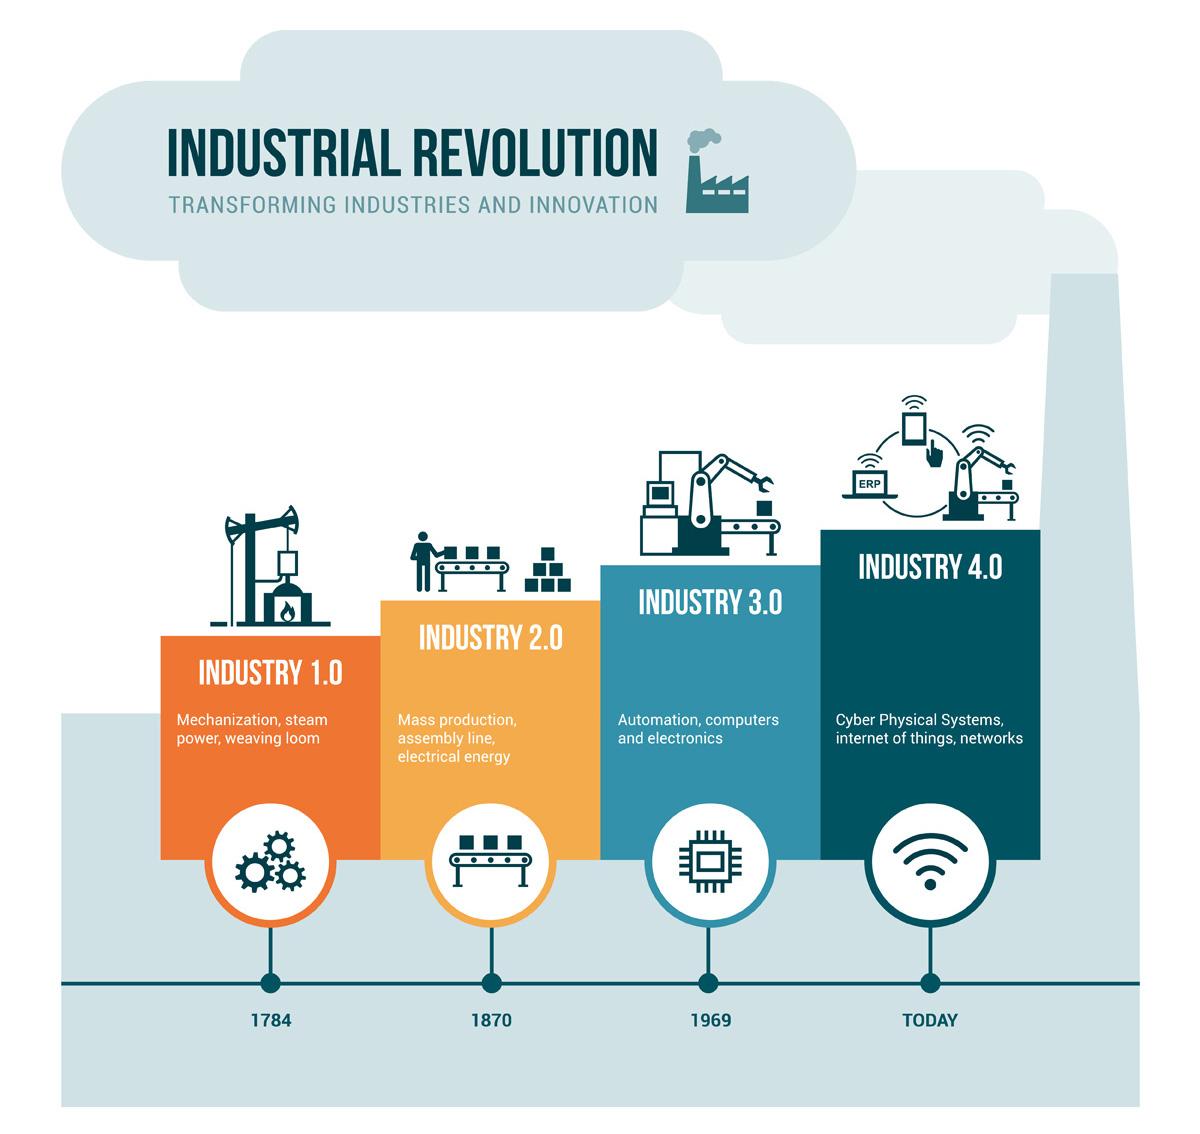 Industrial Revolution2 - spacenews.com